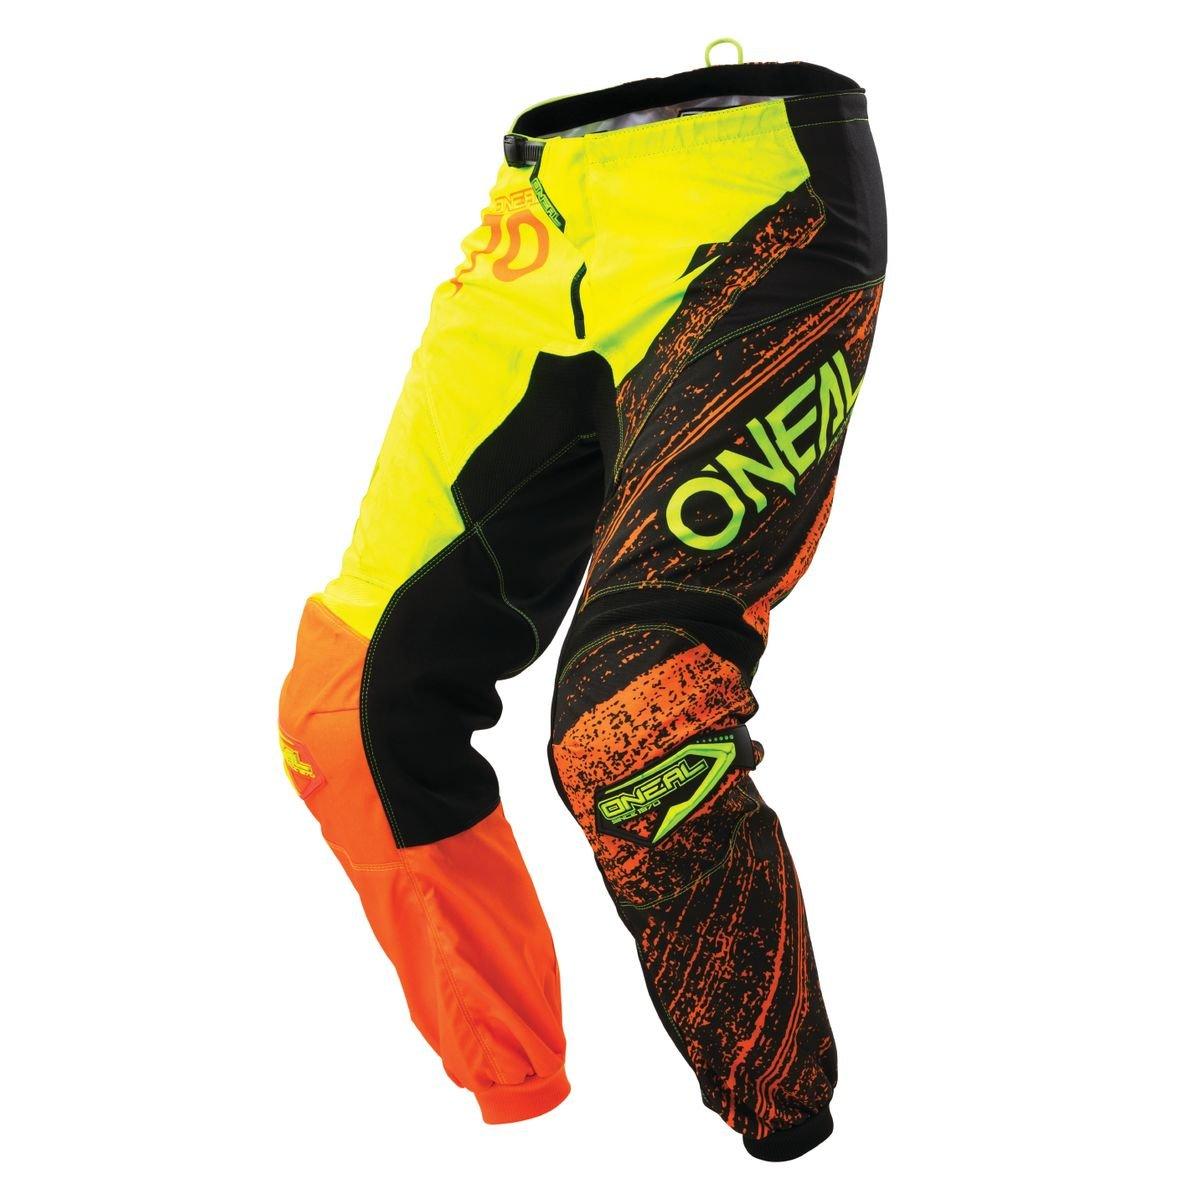 0108-964 - Oneal Element 2018 Burnout Motocross Pants 34 Black Hi-Viz Orange